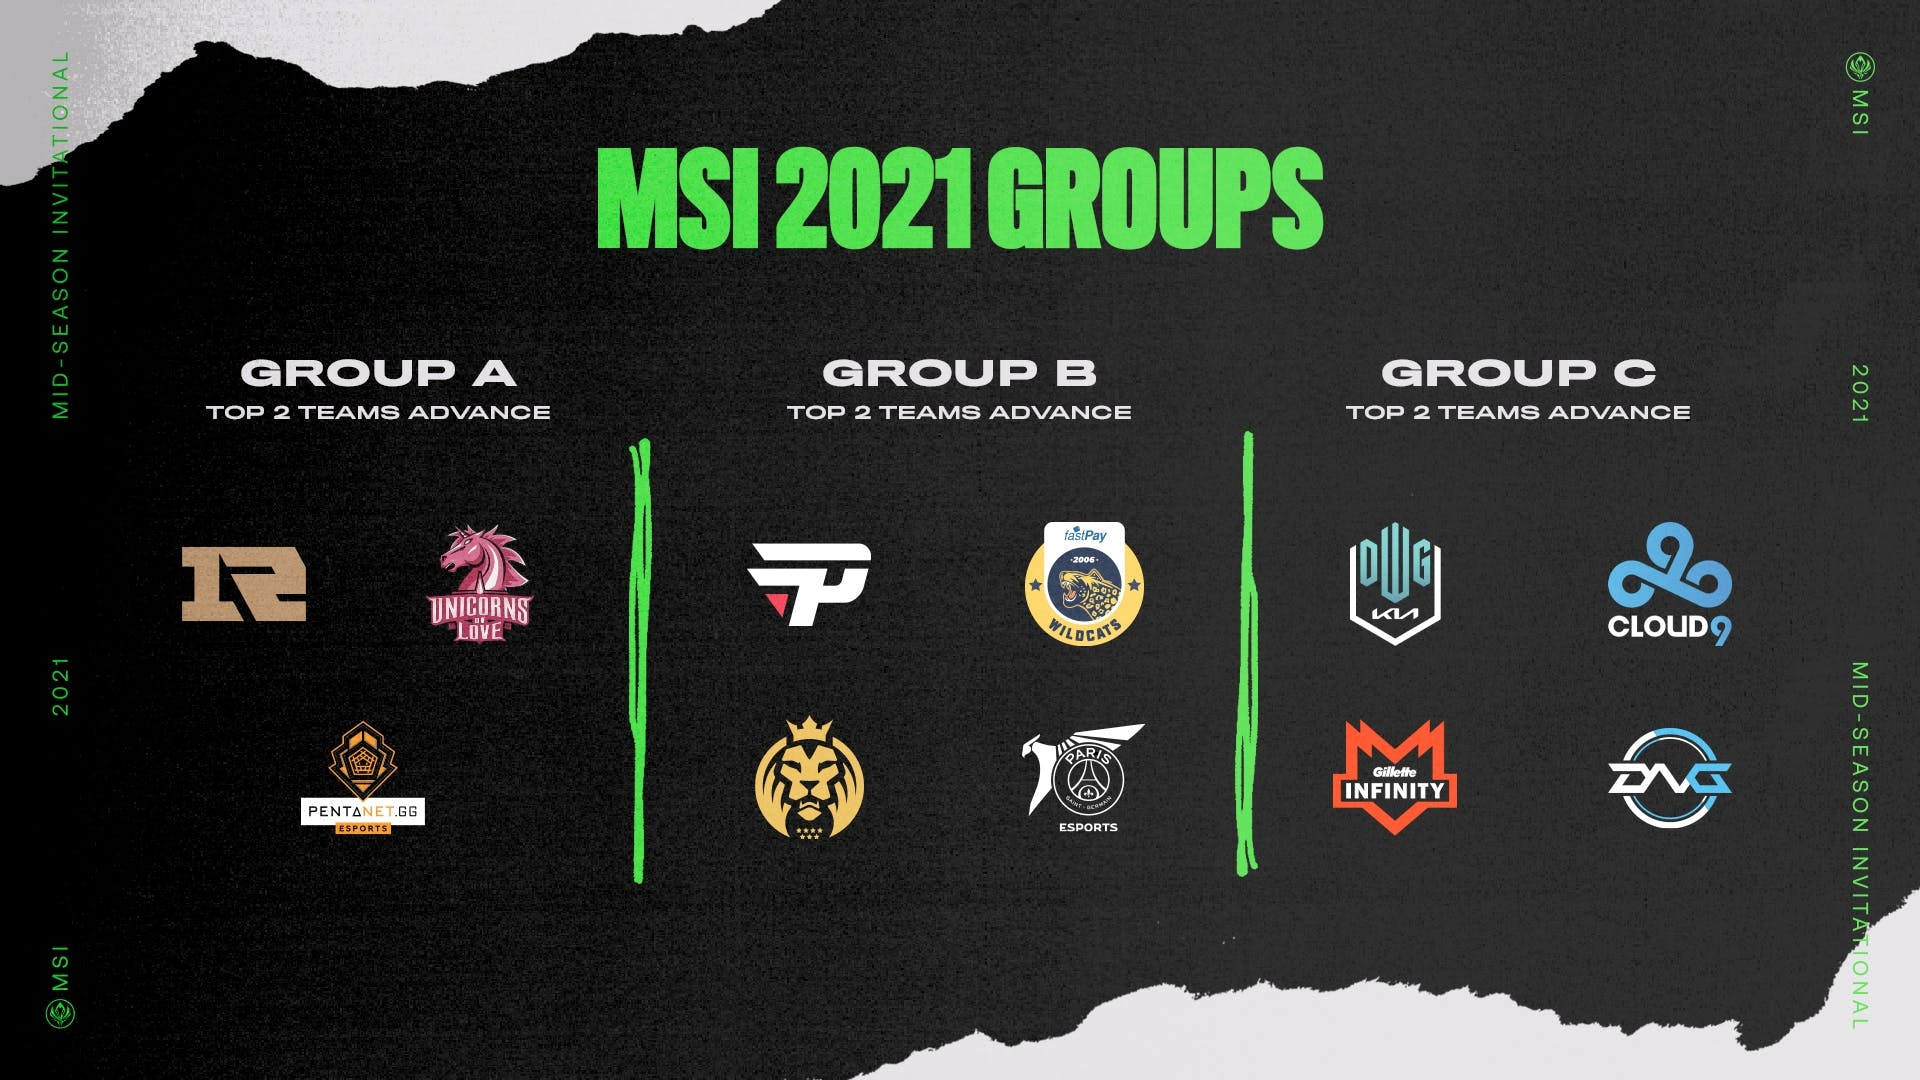 03_groups_team_graphics.jpg